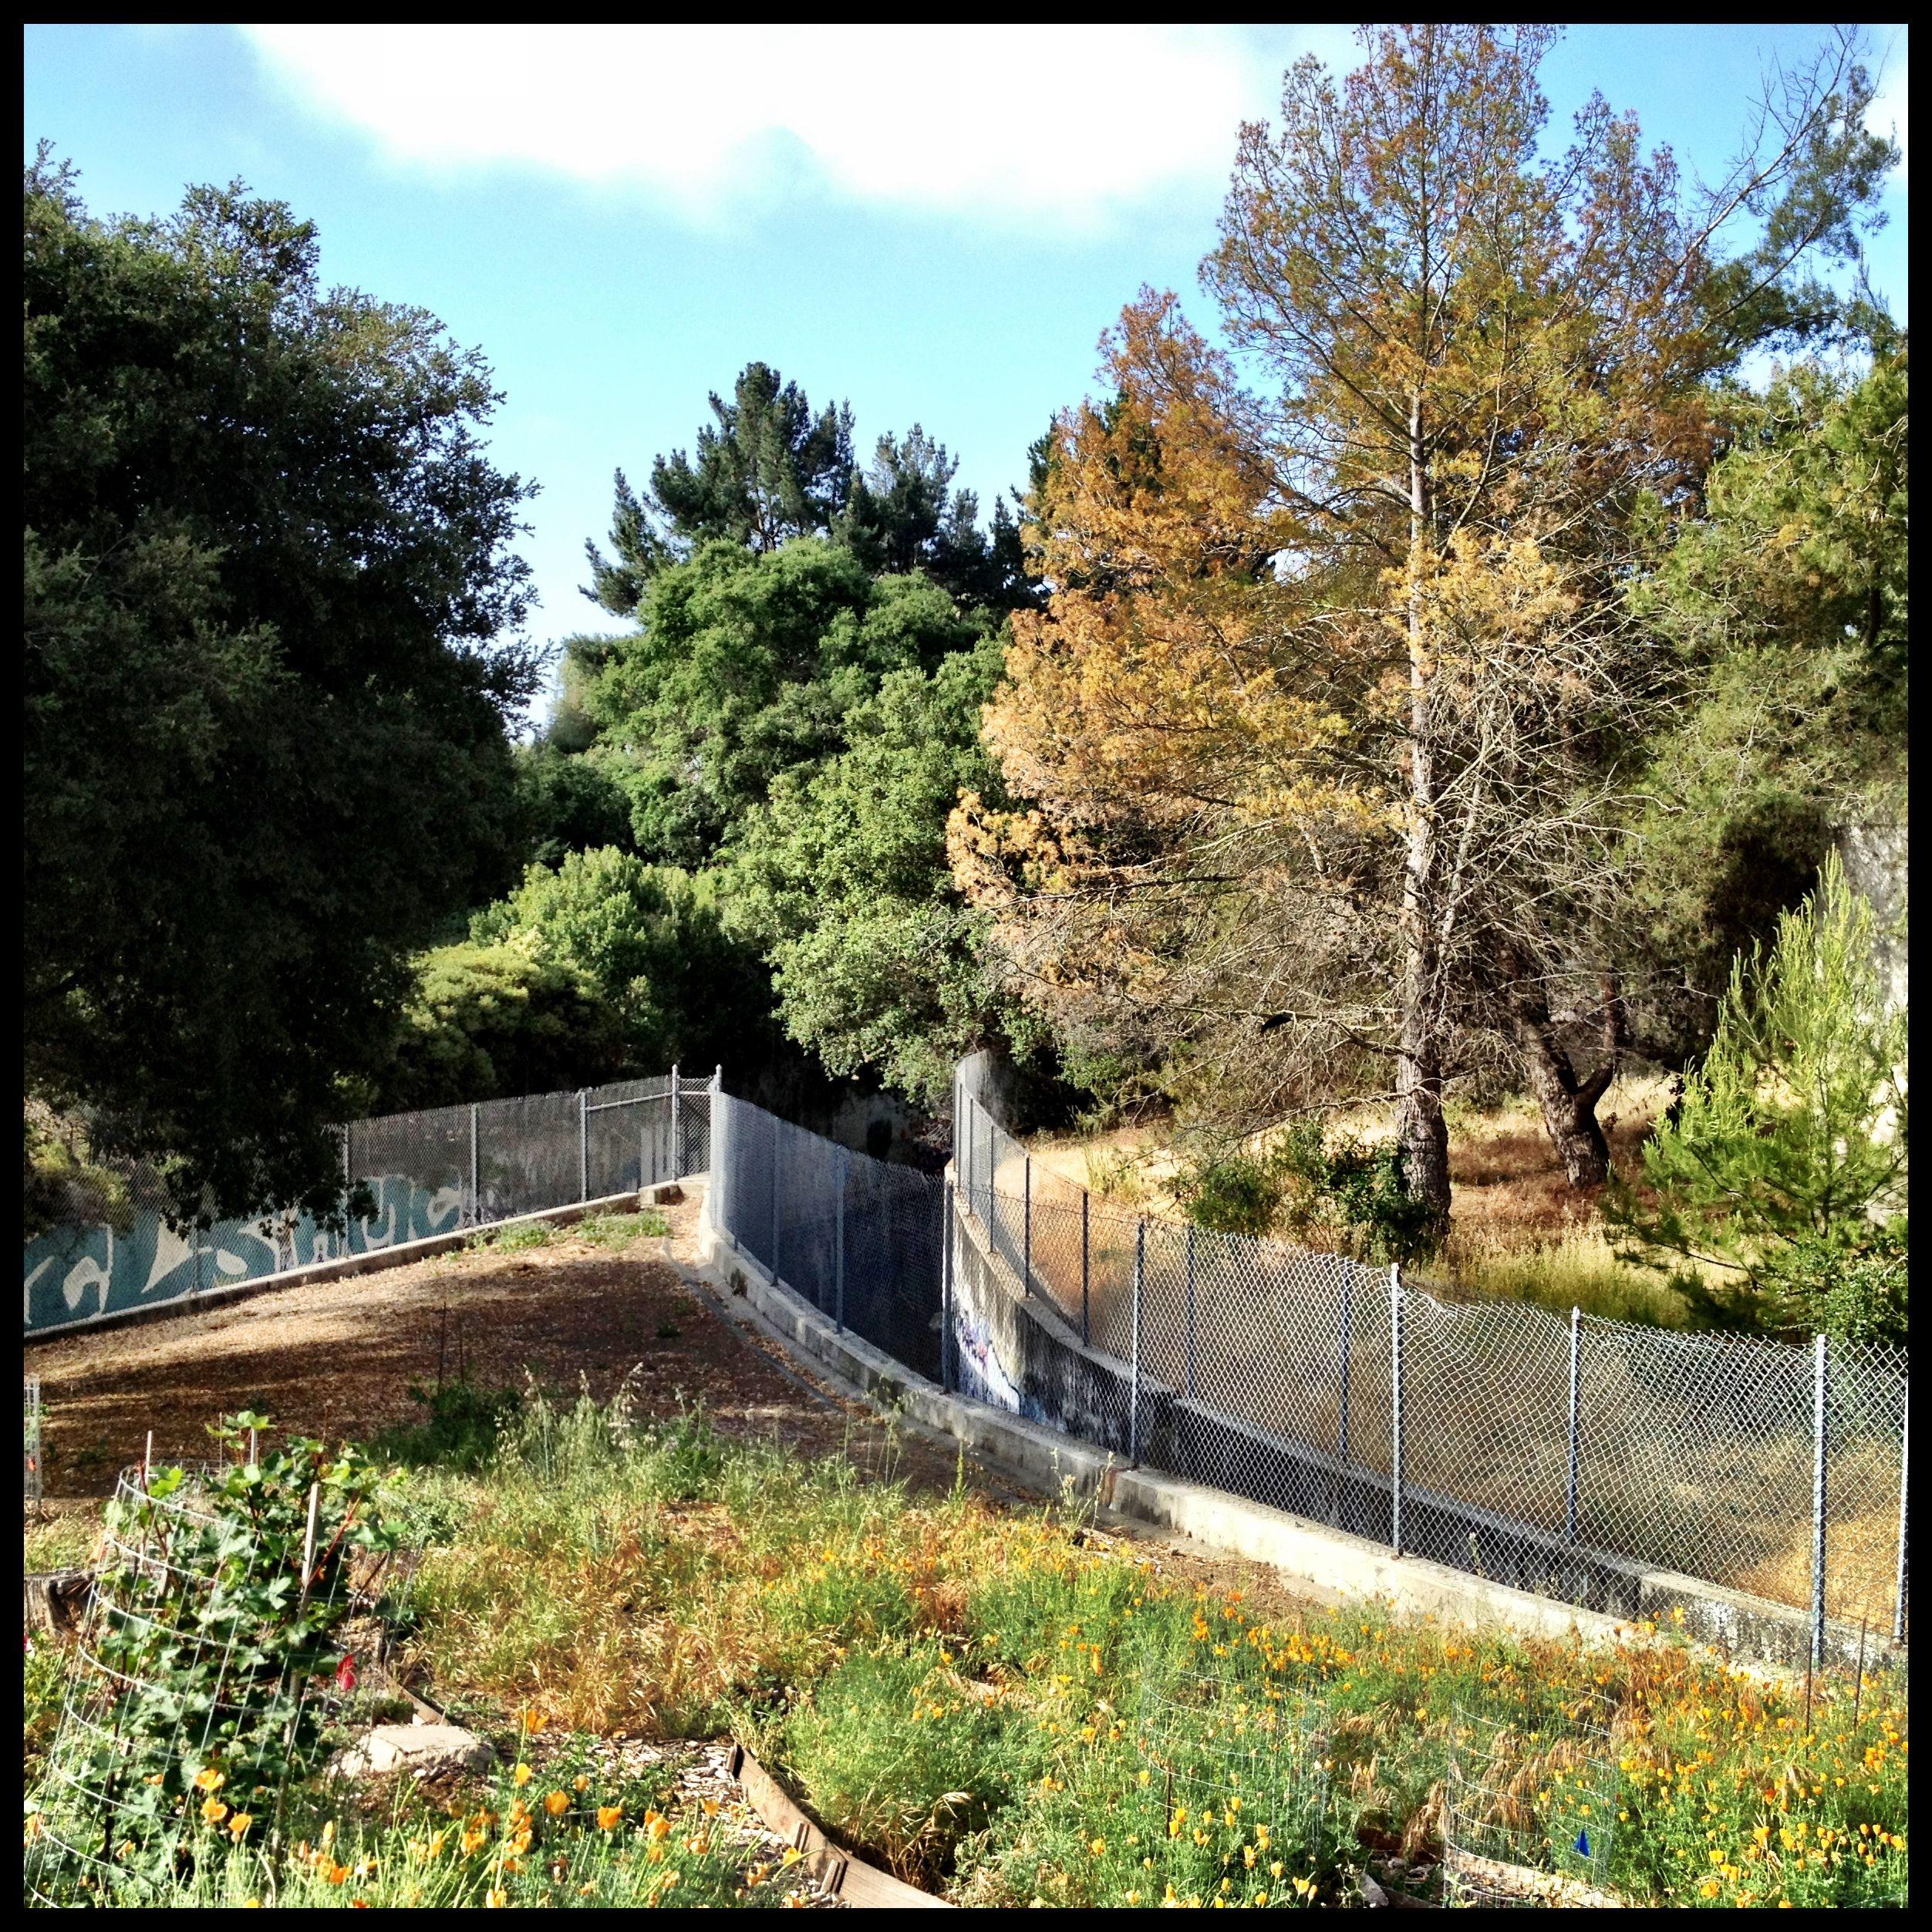 cv castrovalley cvlegends baytreespark Castro valley